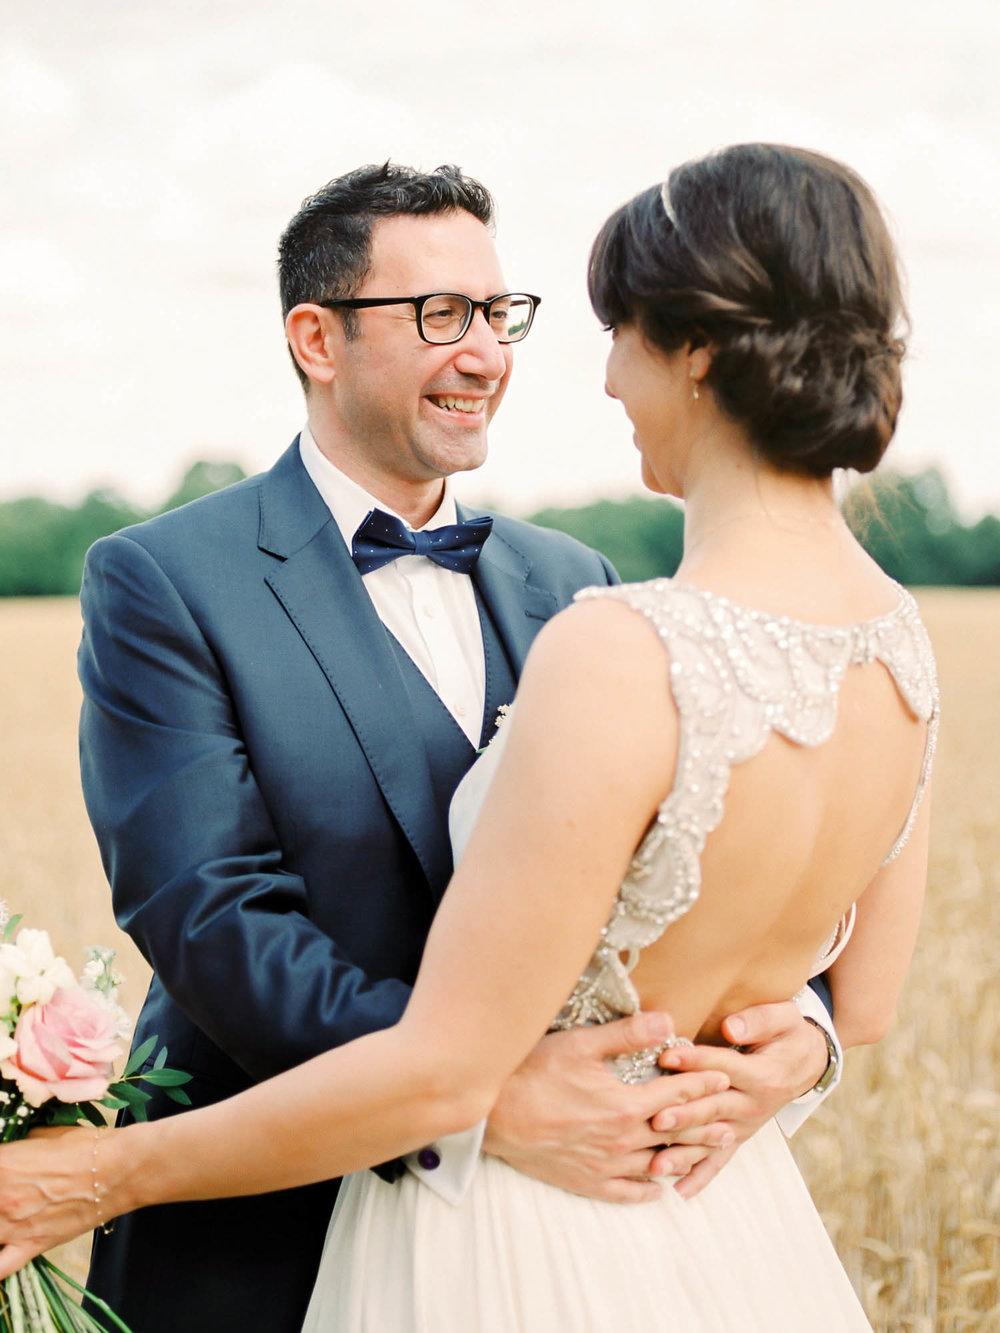 Amy O'Boyle Photography- Destination & UK Fine Art Film Wedding Photographer- Brickendonbury Estate Wedding-28.jpg